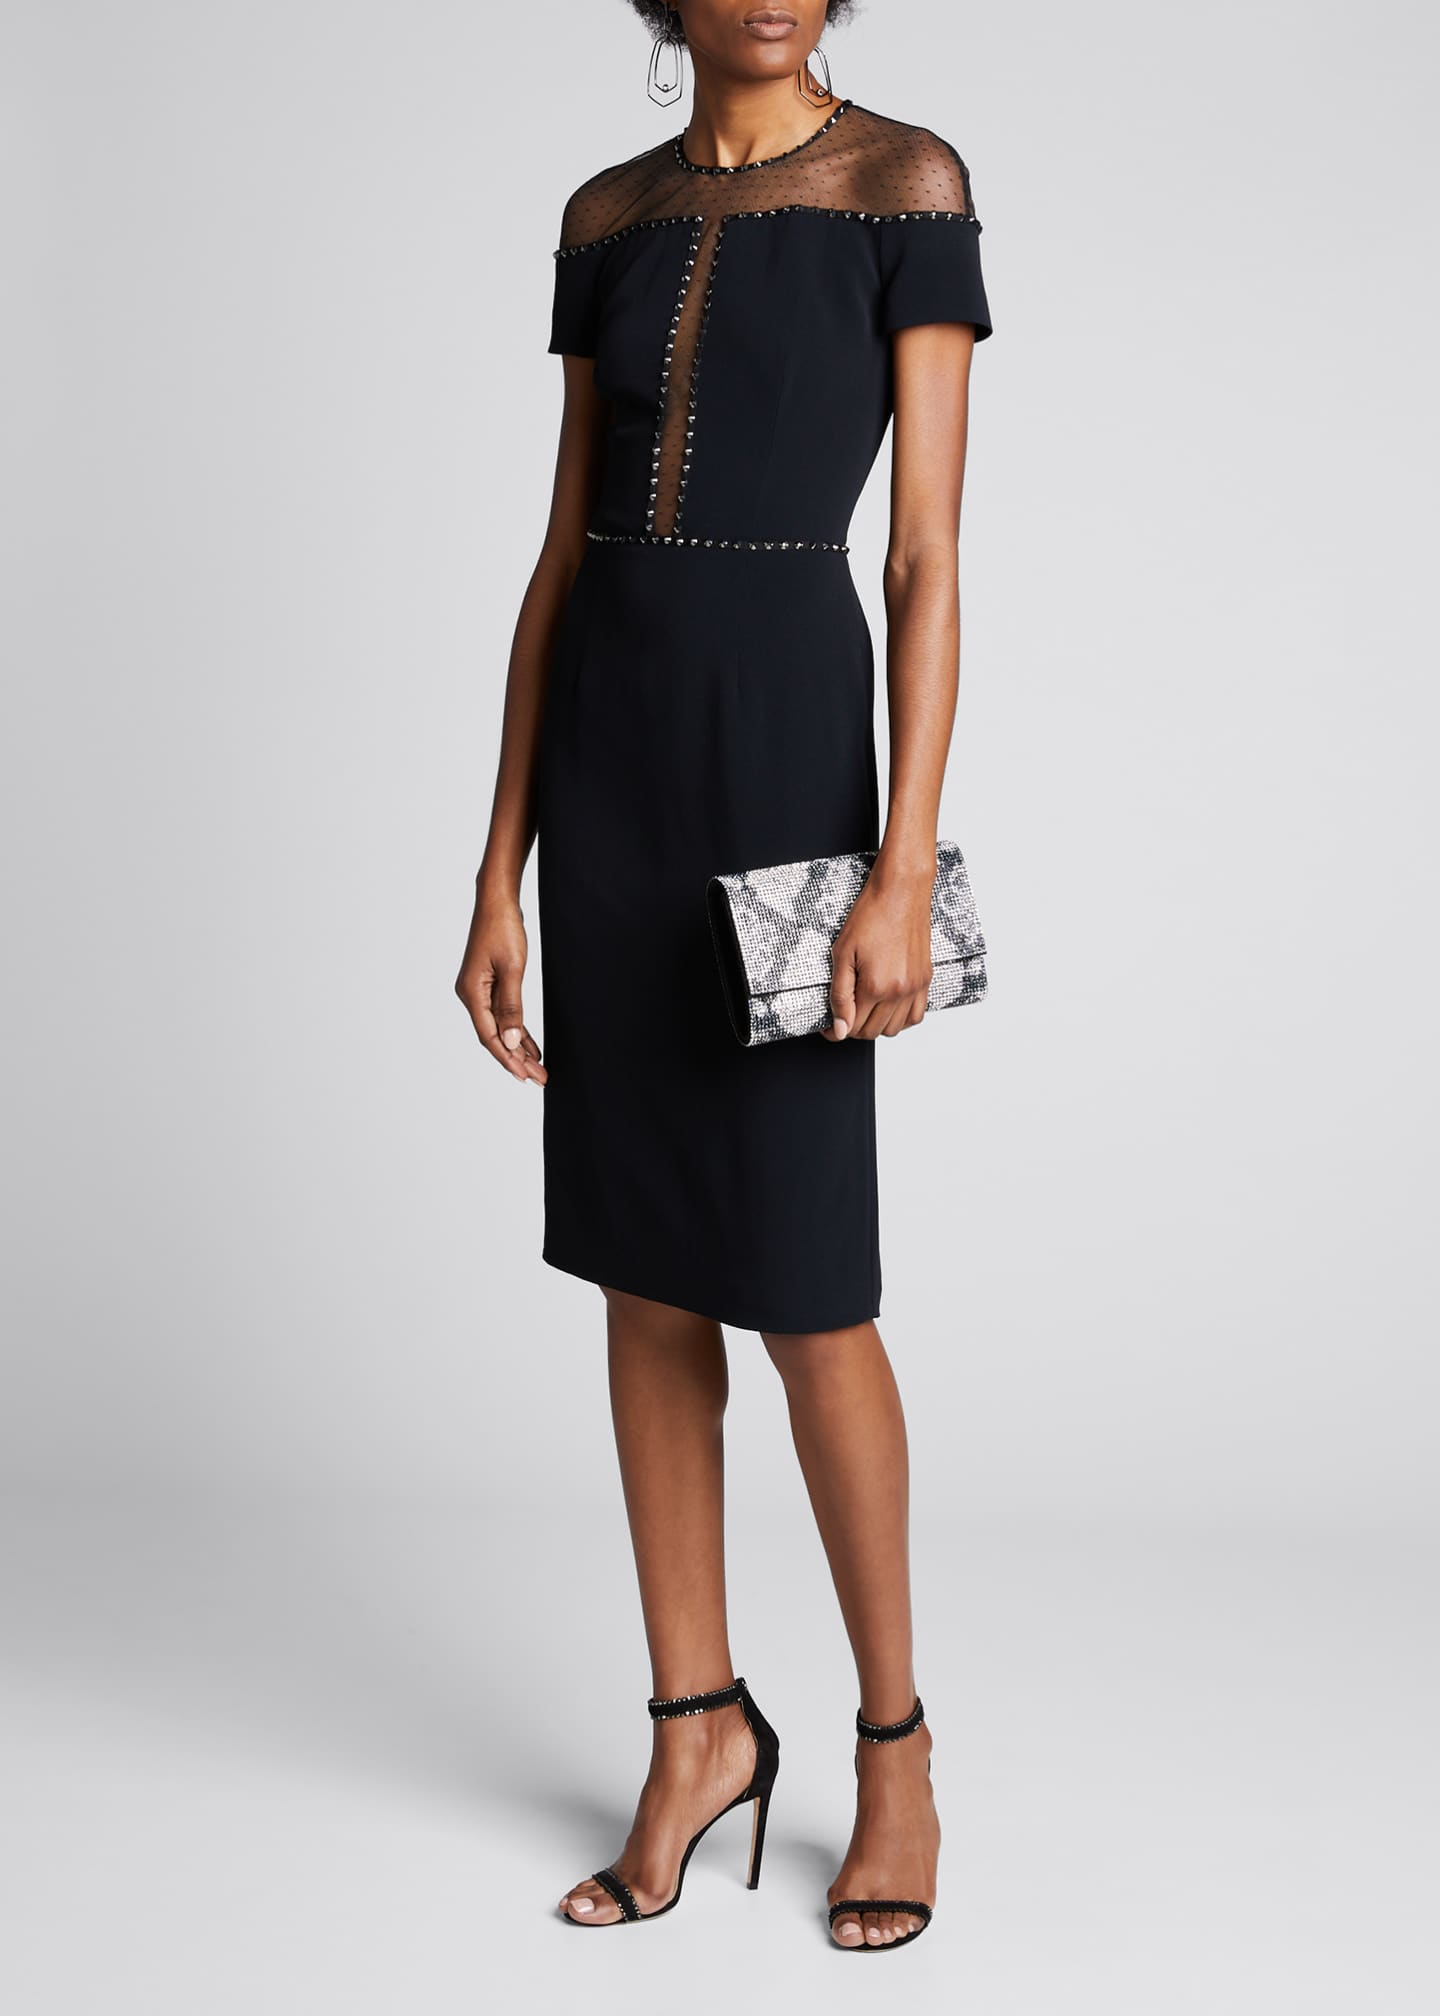 Jenny Packham Cap-Sleeve Mesh Sequined Dress